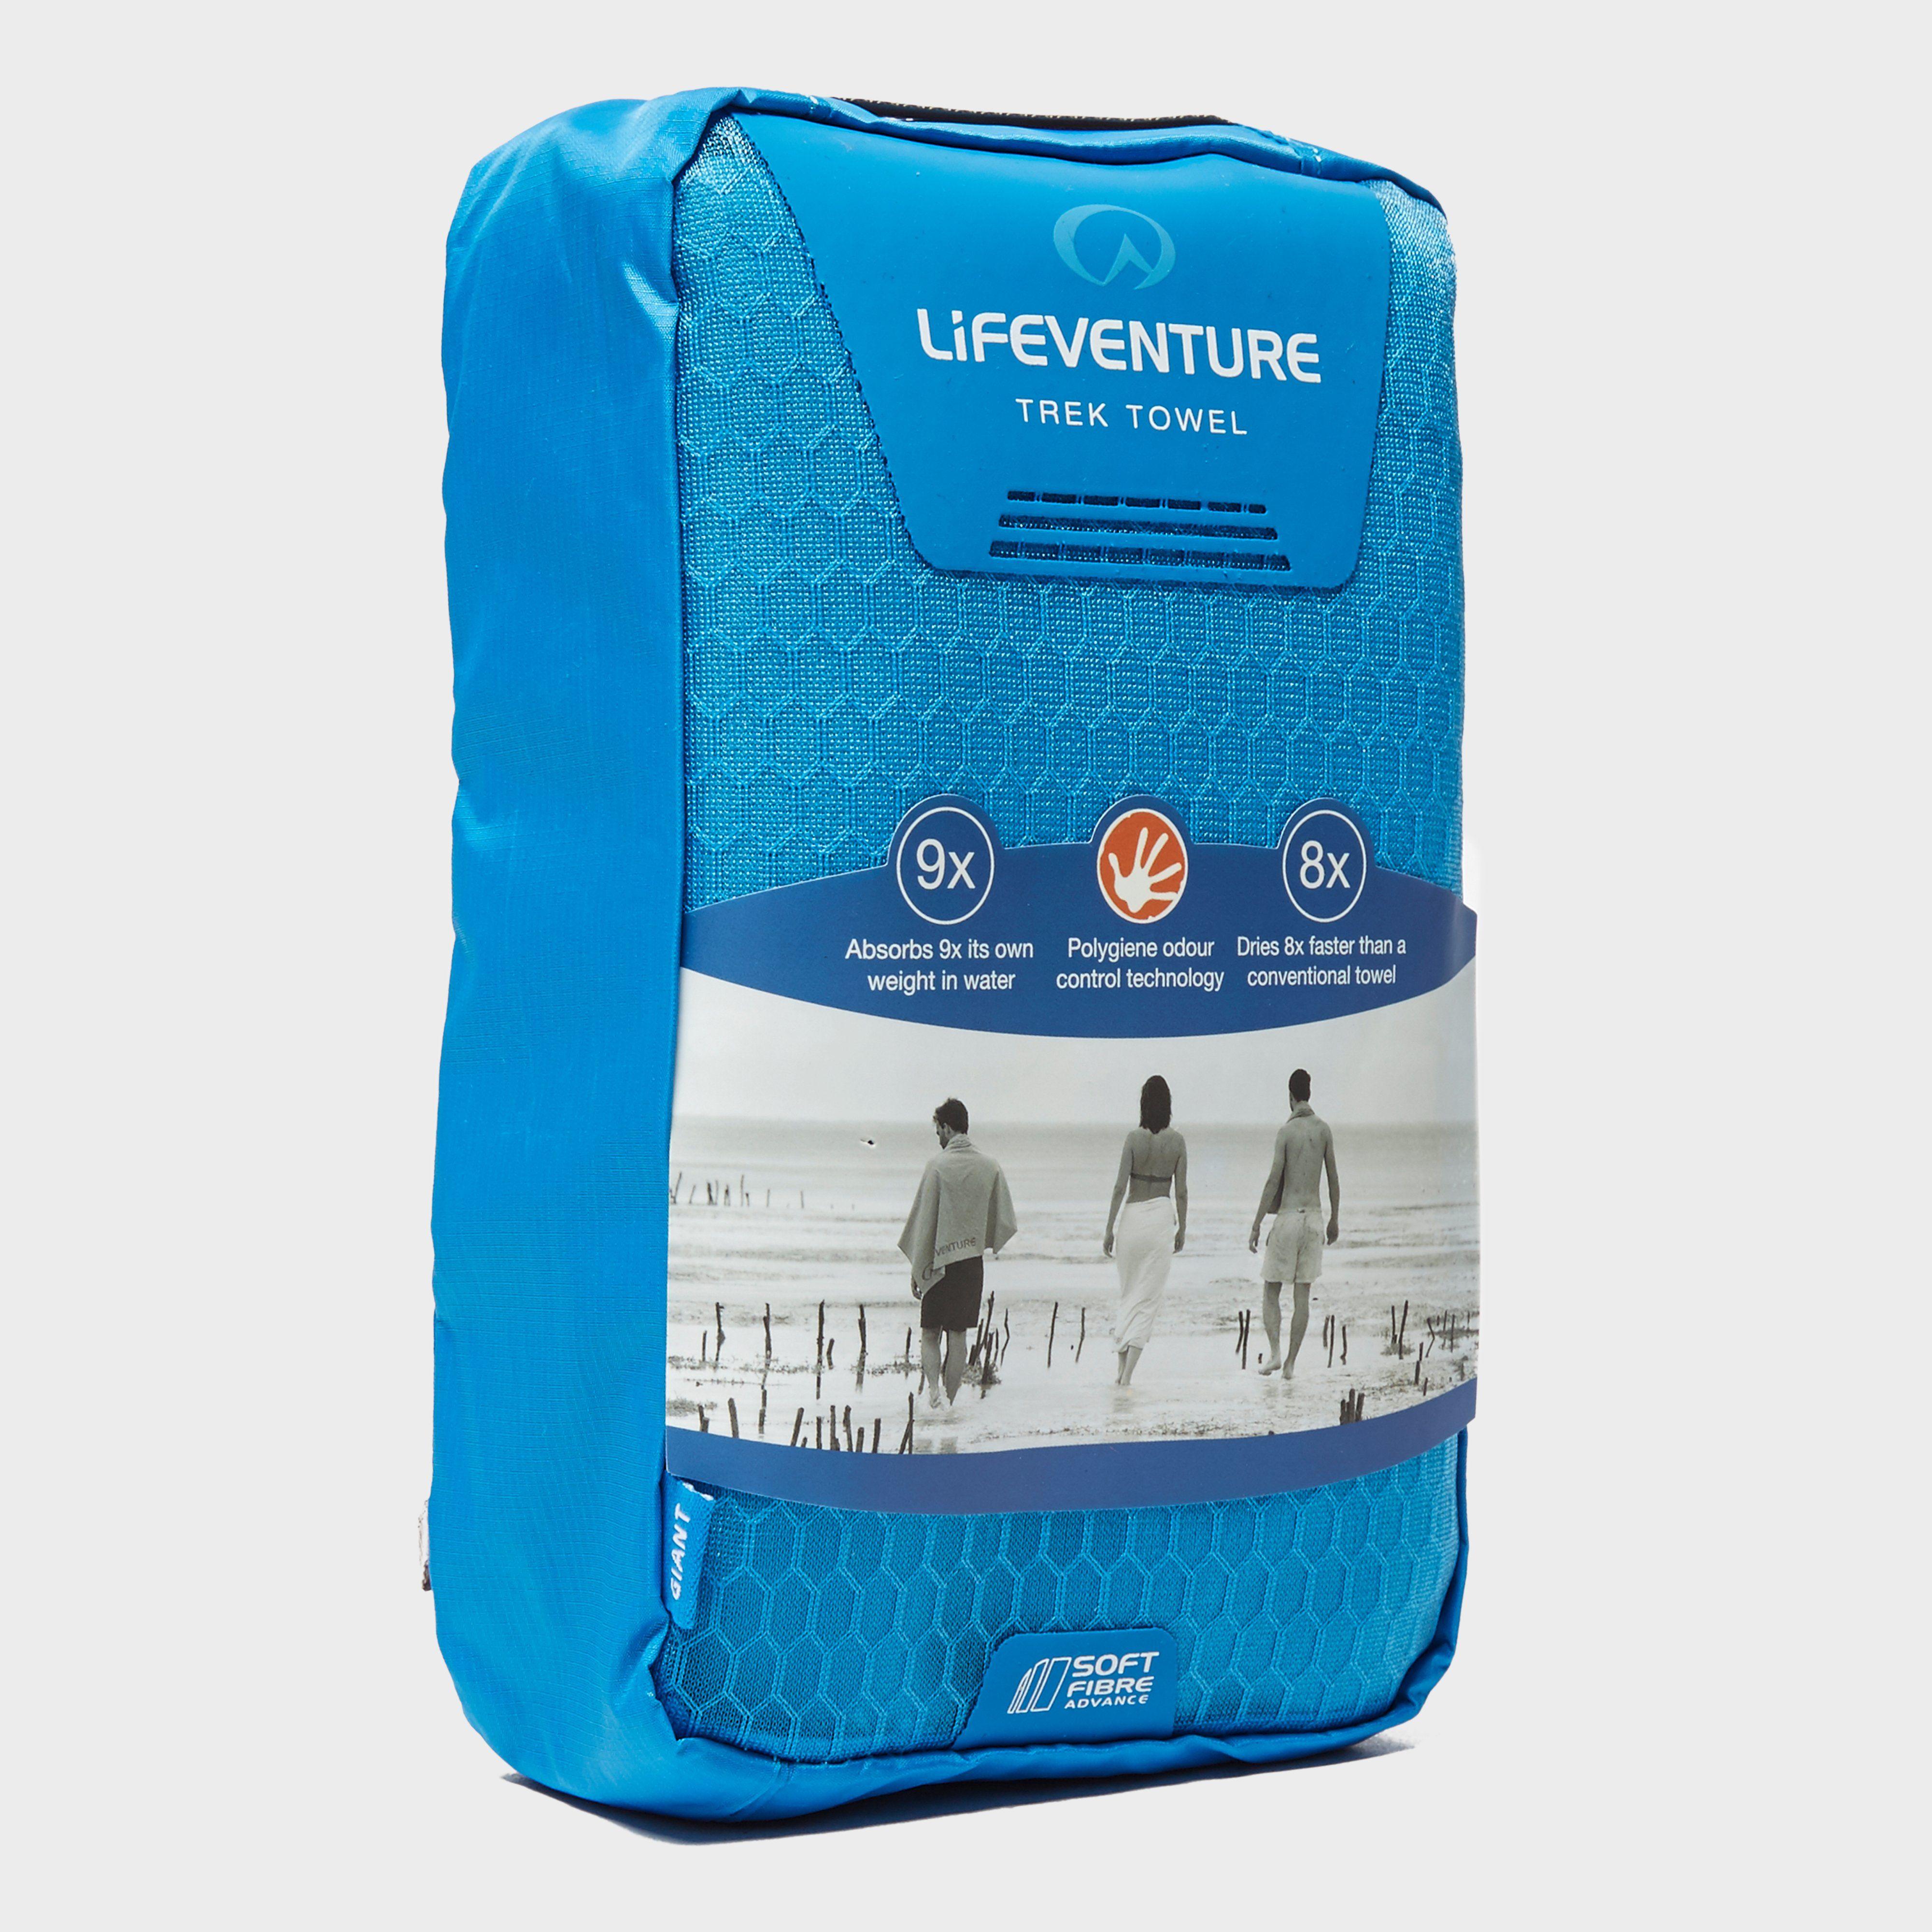 LIFEVENTURE Soft Fibre Advanced Travel Towel (Giant)